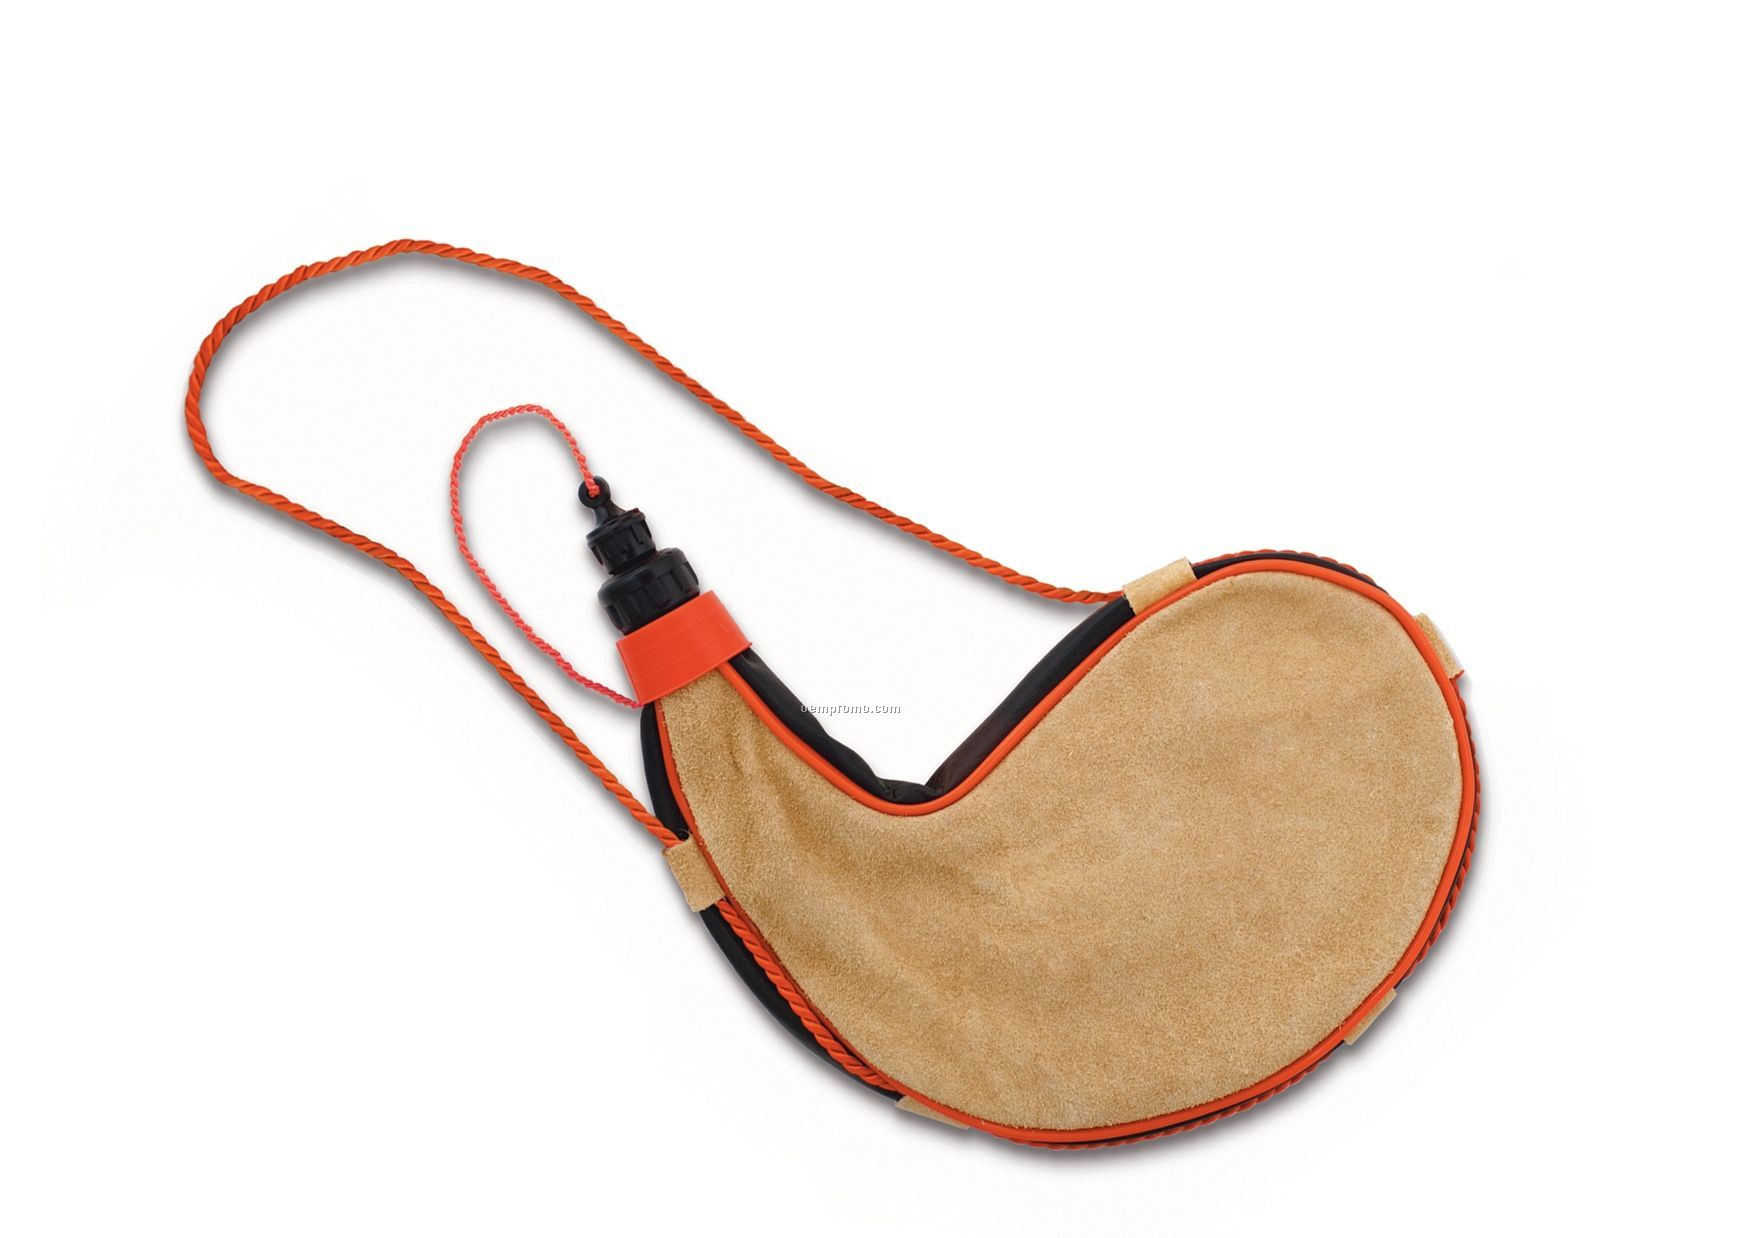 1 Liter Latex Lined Bota Leather Bag